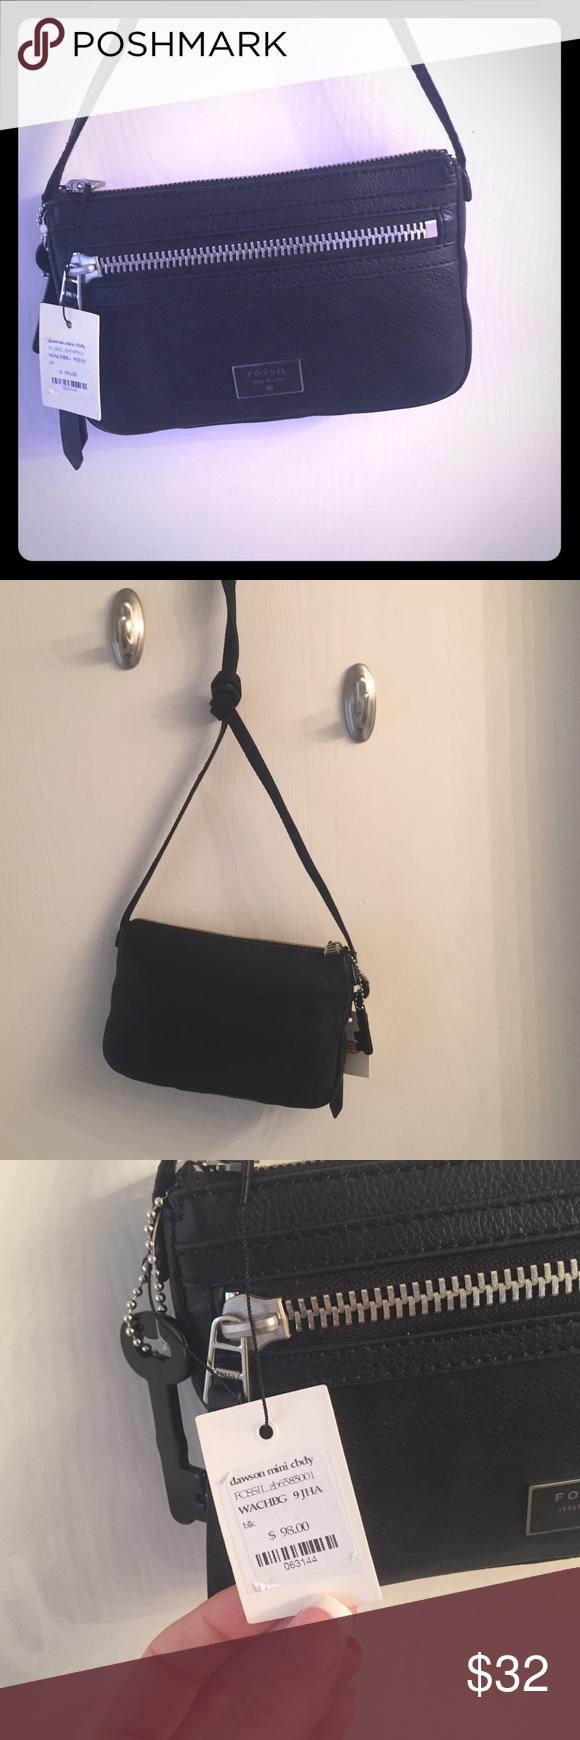 Black cross body purse Brand new black cross body bag Fossil Bags Crossbody Bags